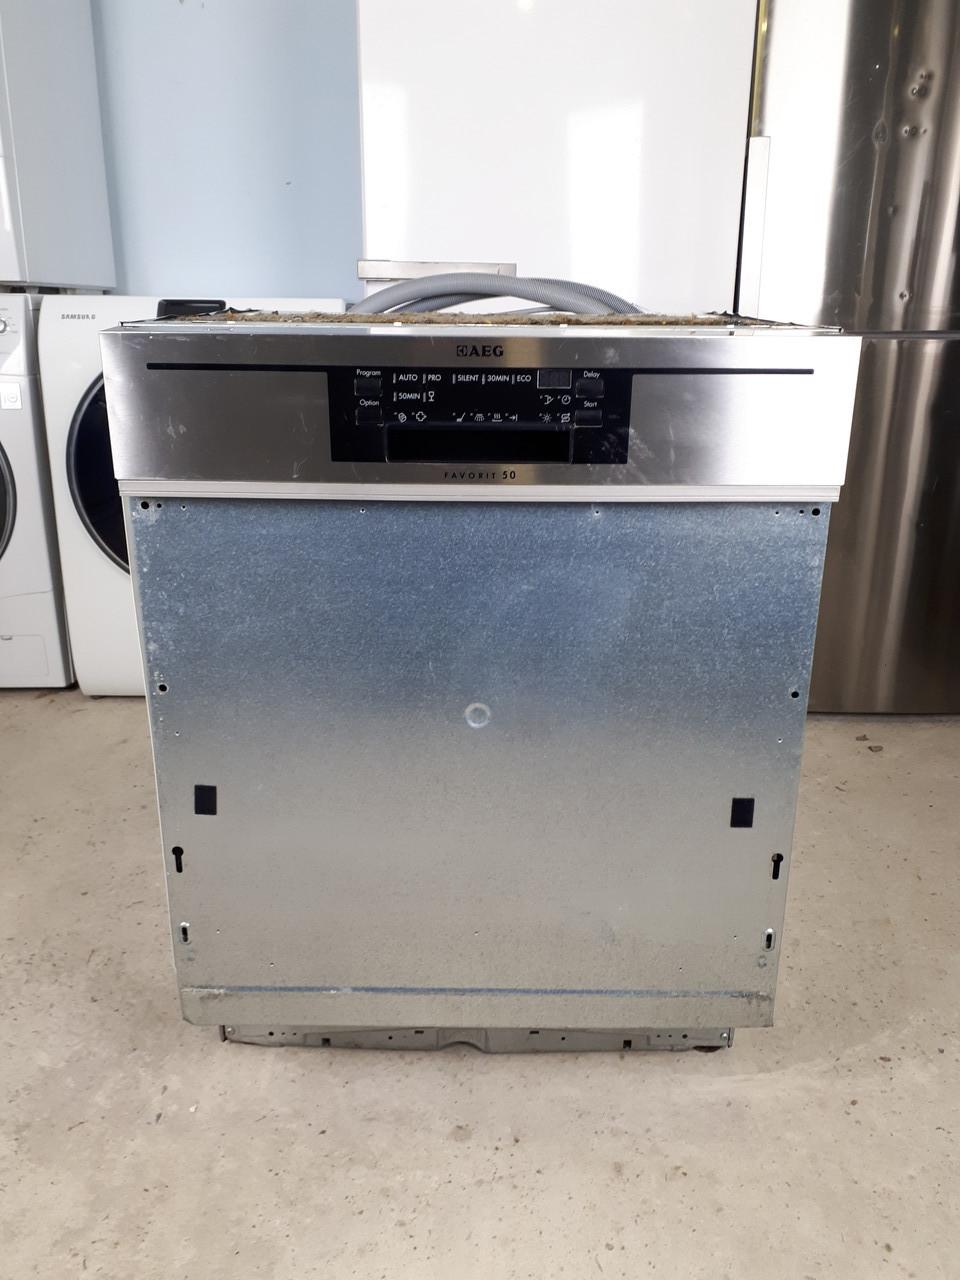 Aeg fav50eim0p Посудомоечная машина